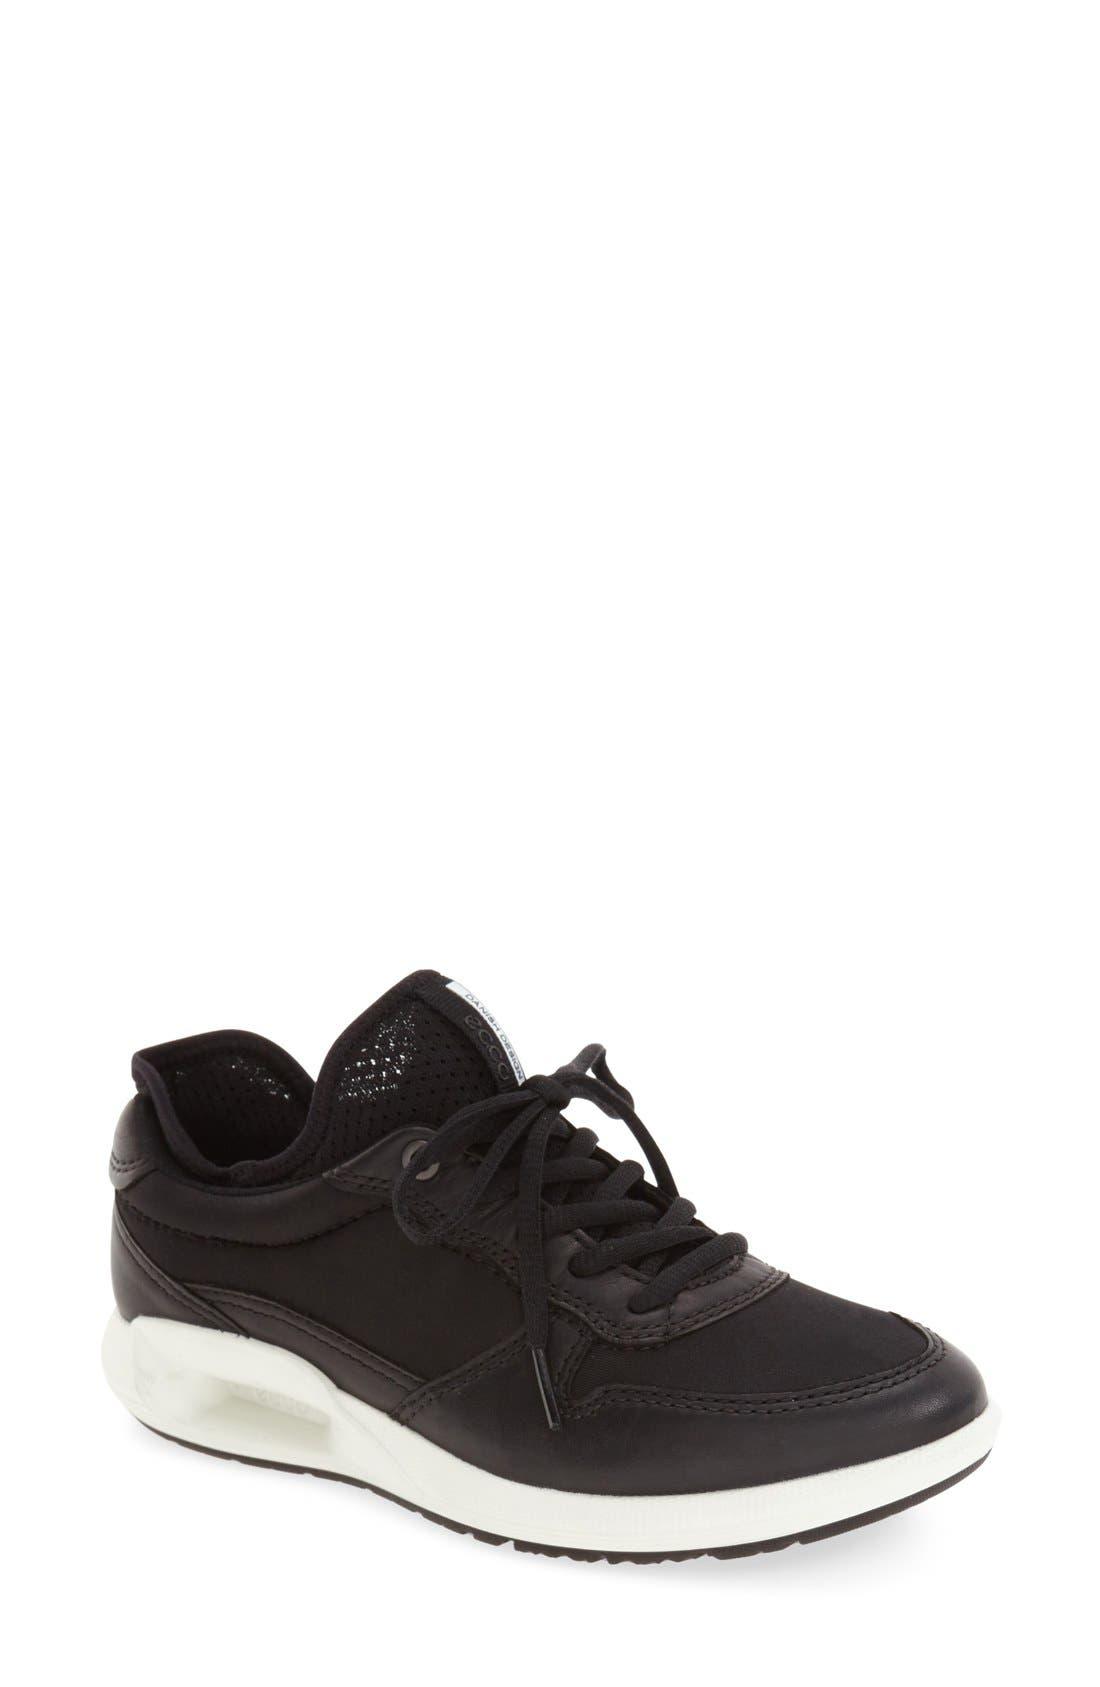 'CS16' Sneaker,                             Main thumbnail 1, color,                             001